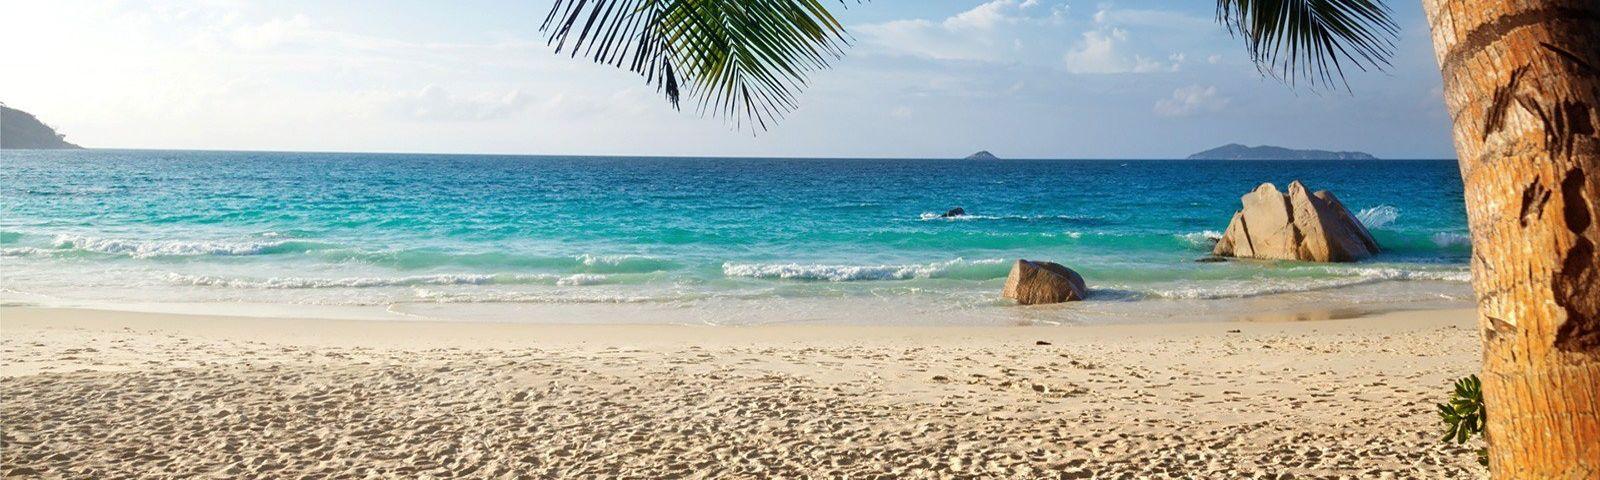 Turquoise water Goa Beach India